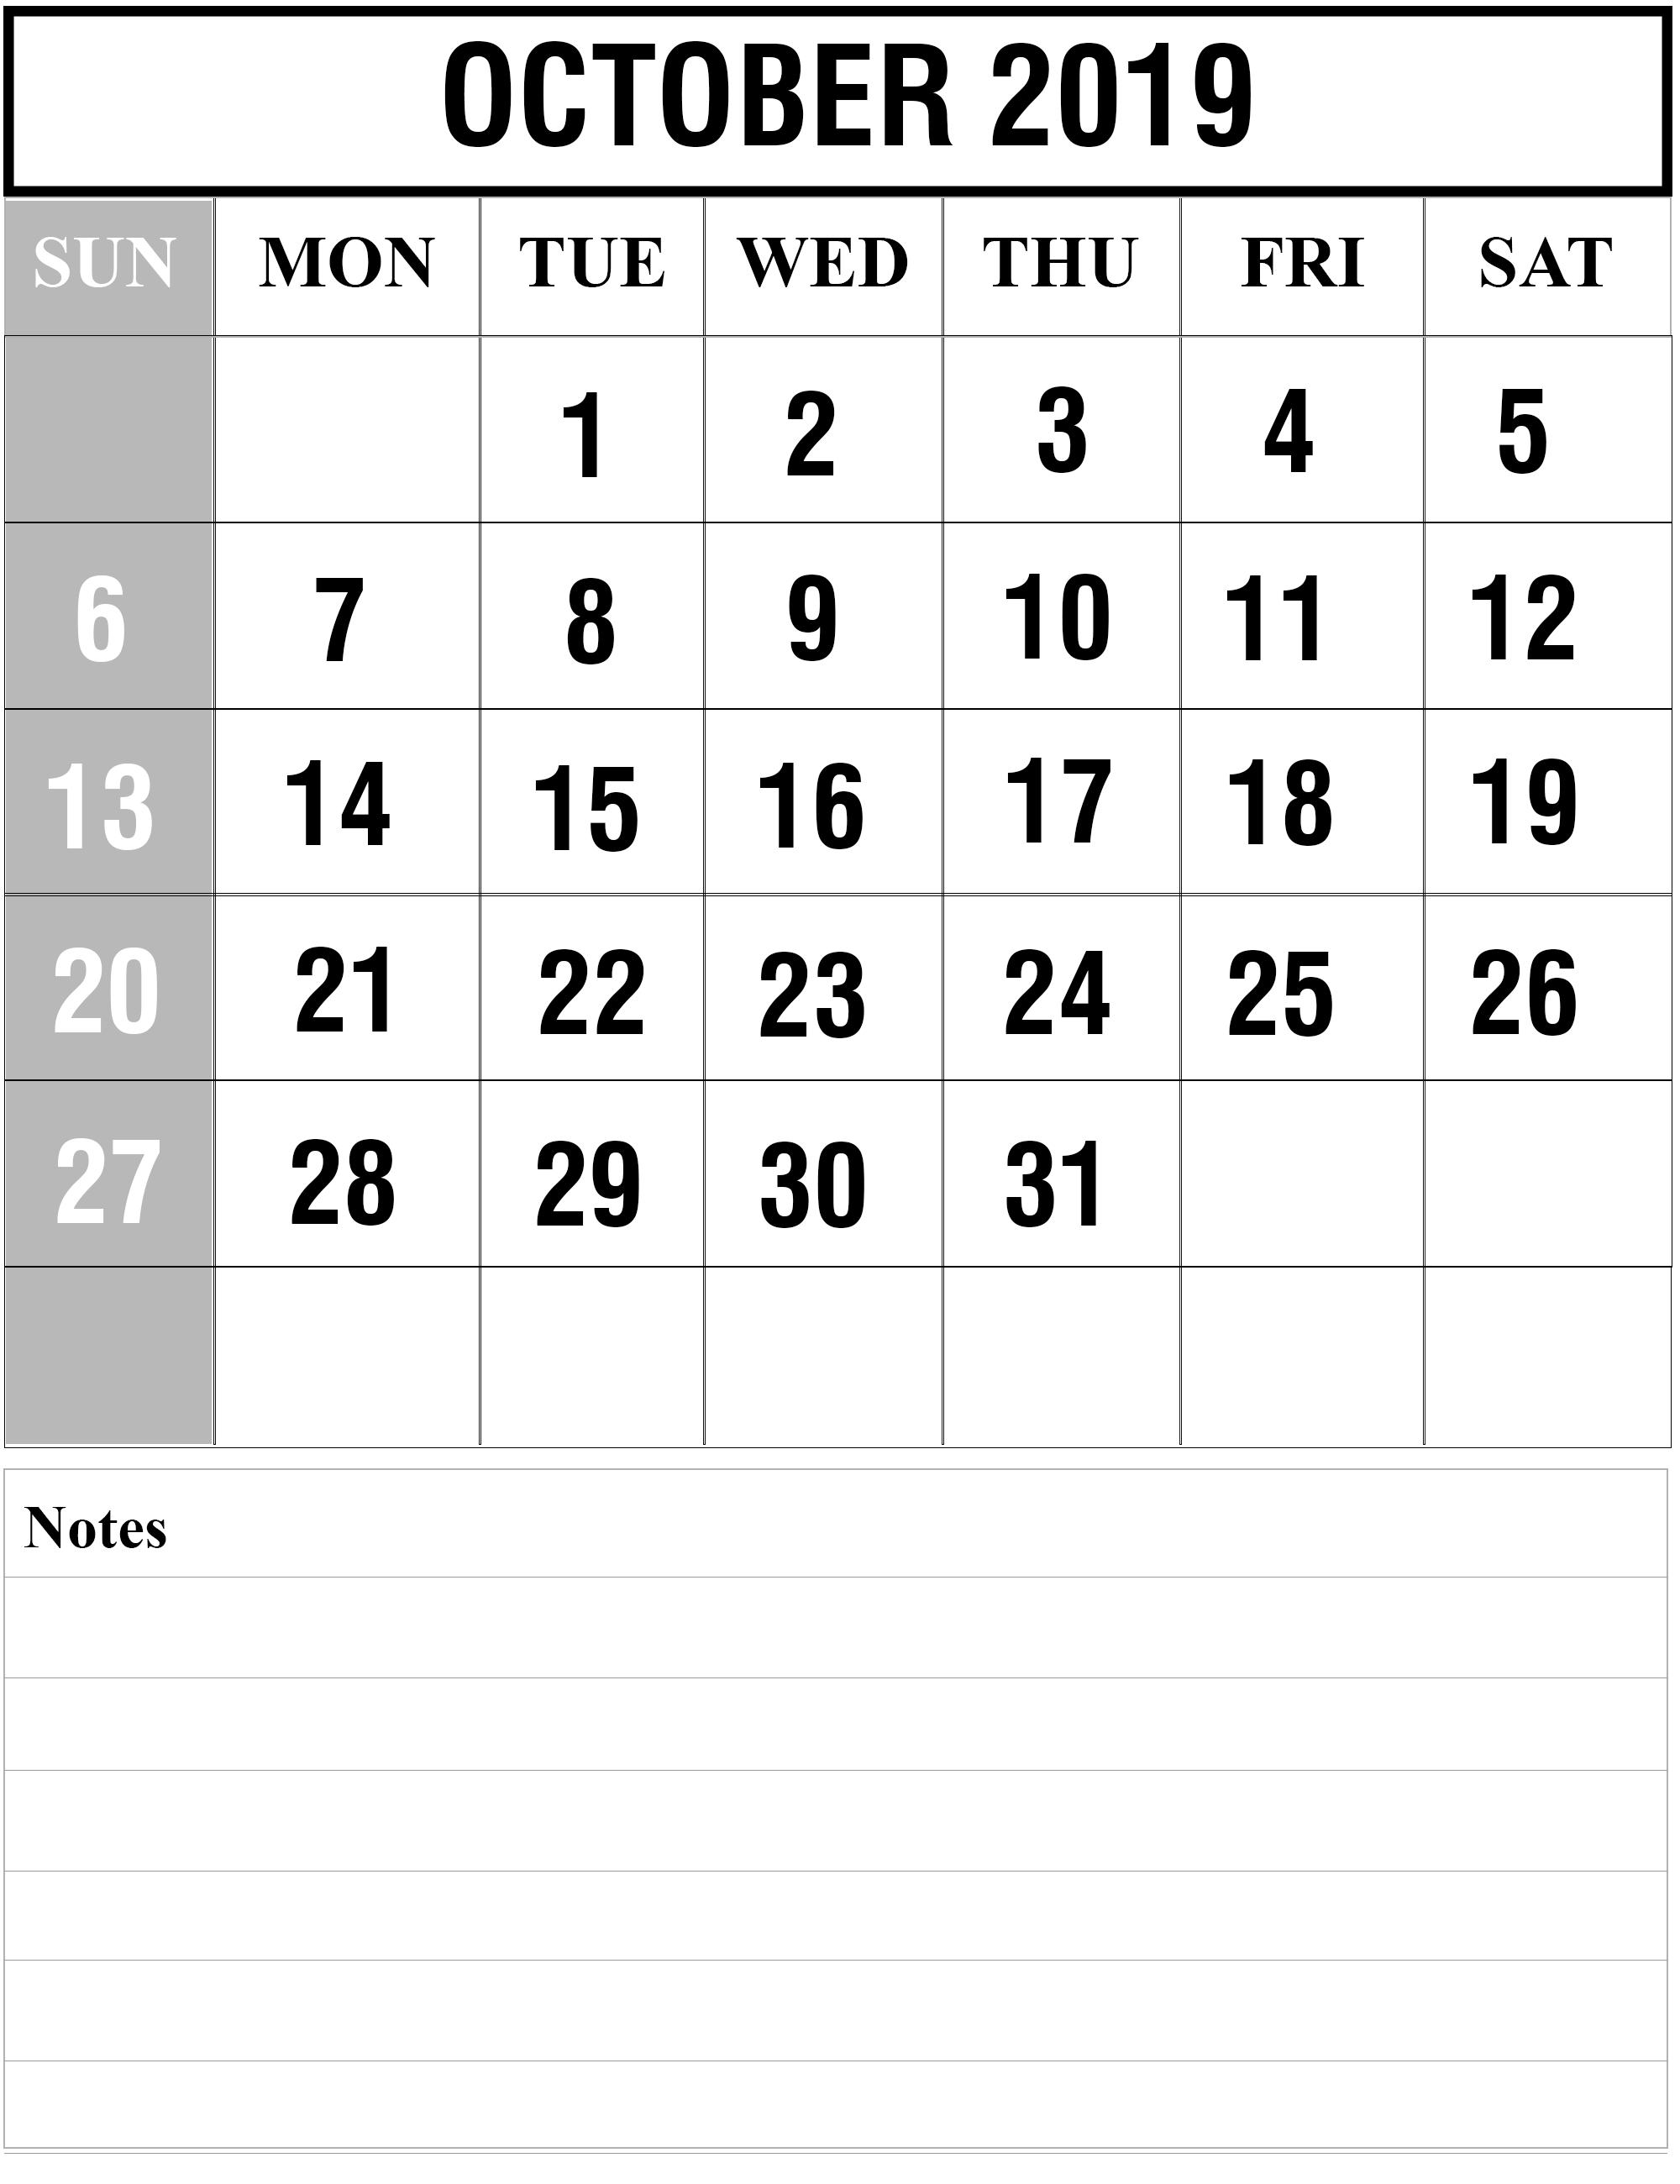 Free October 2019 Printable Calendar Blank Templates